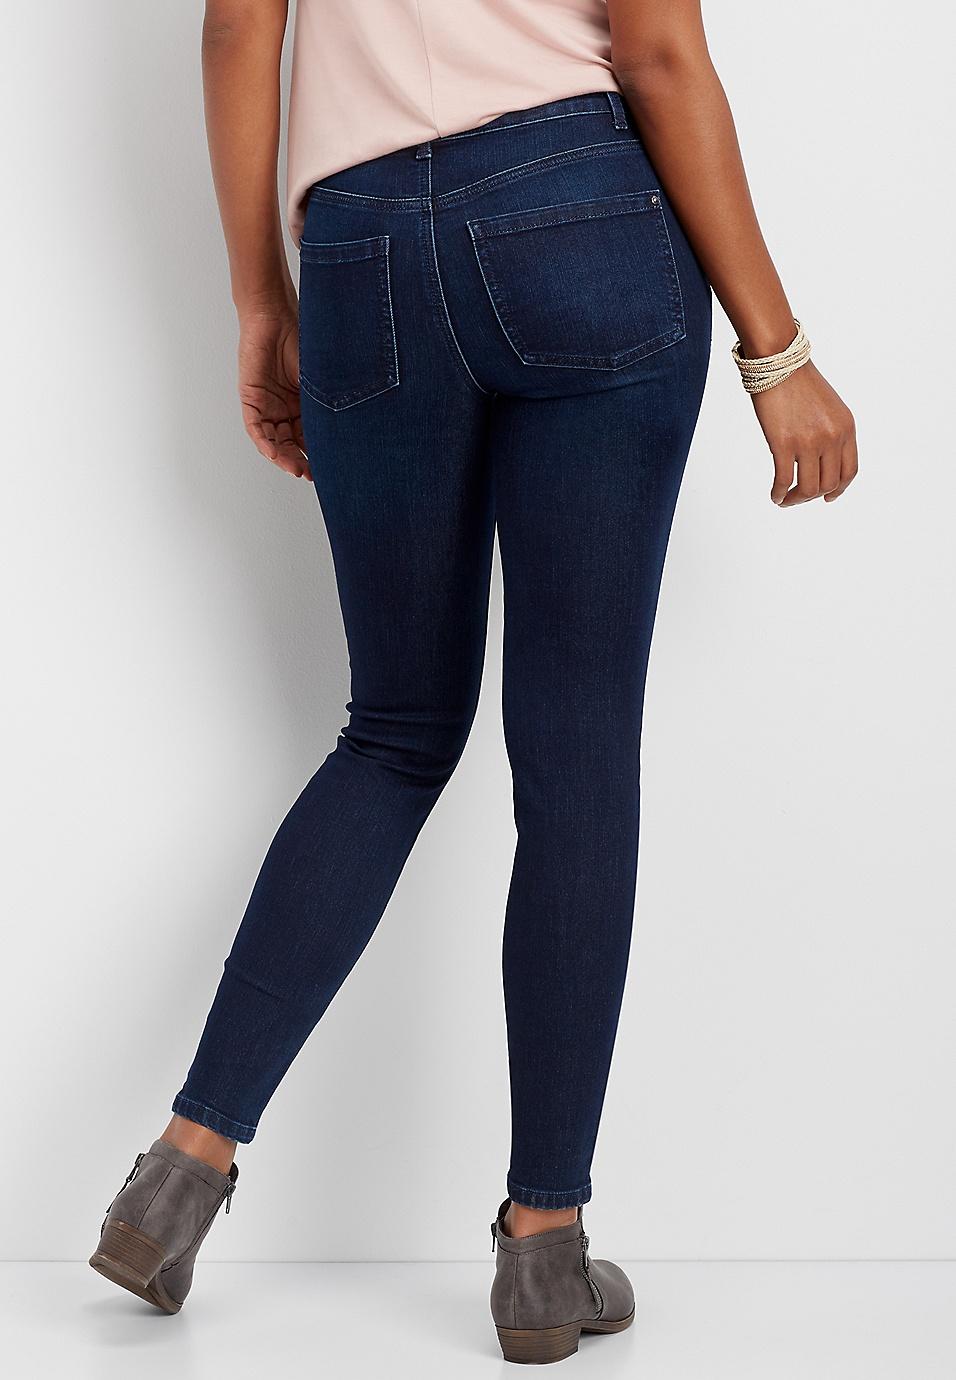 c5f3a1d8e Everflex™ high rise dark stretch skinny jeans   maurices